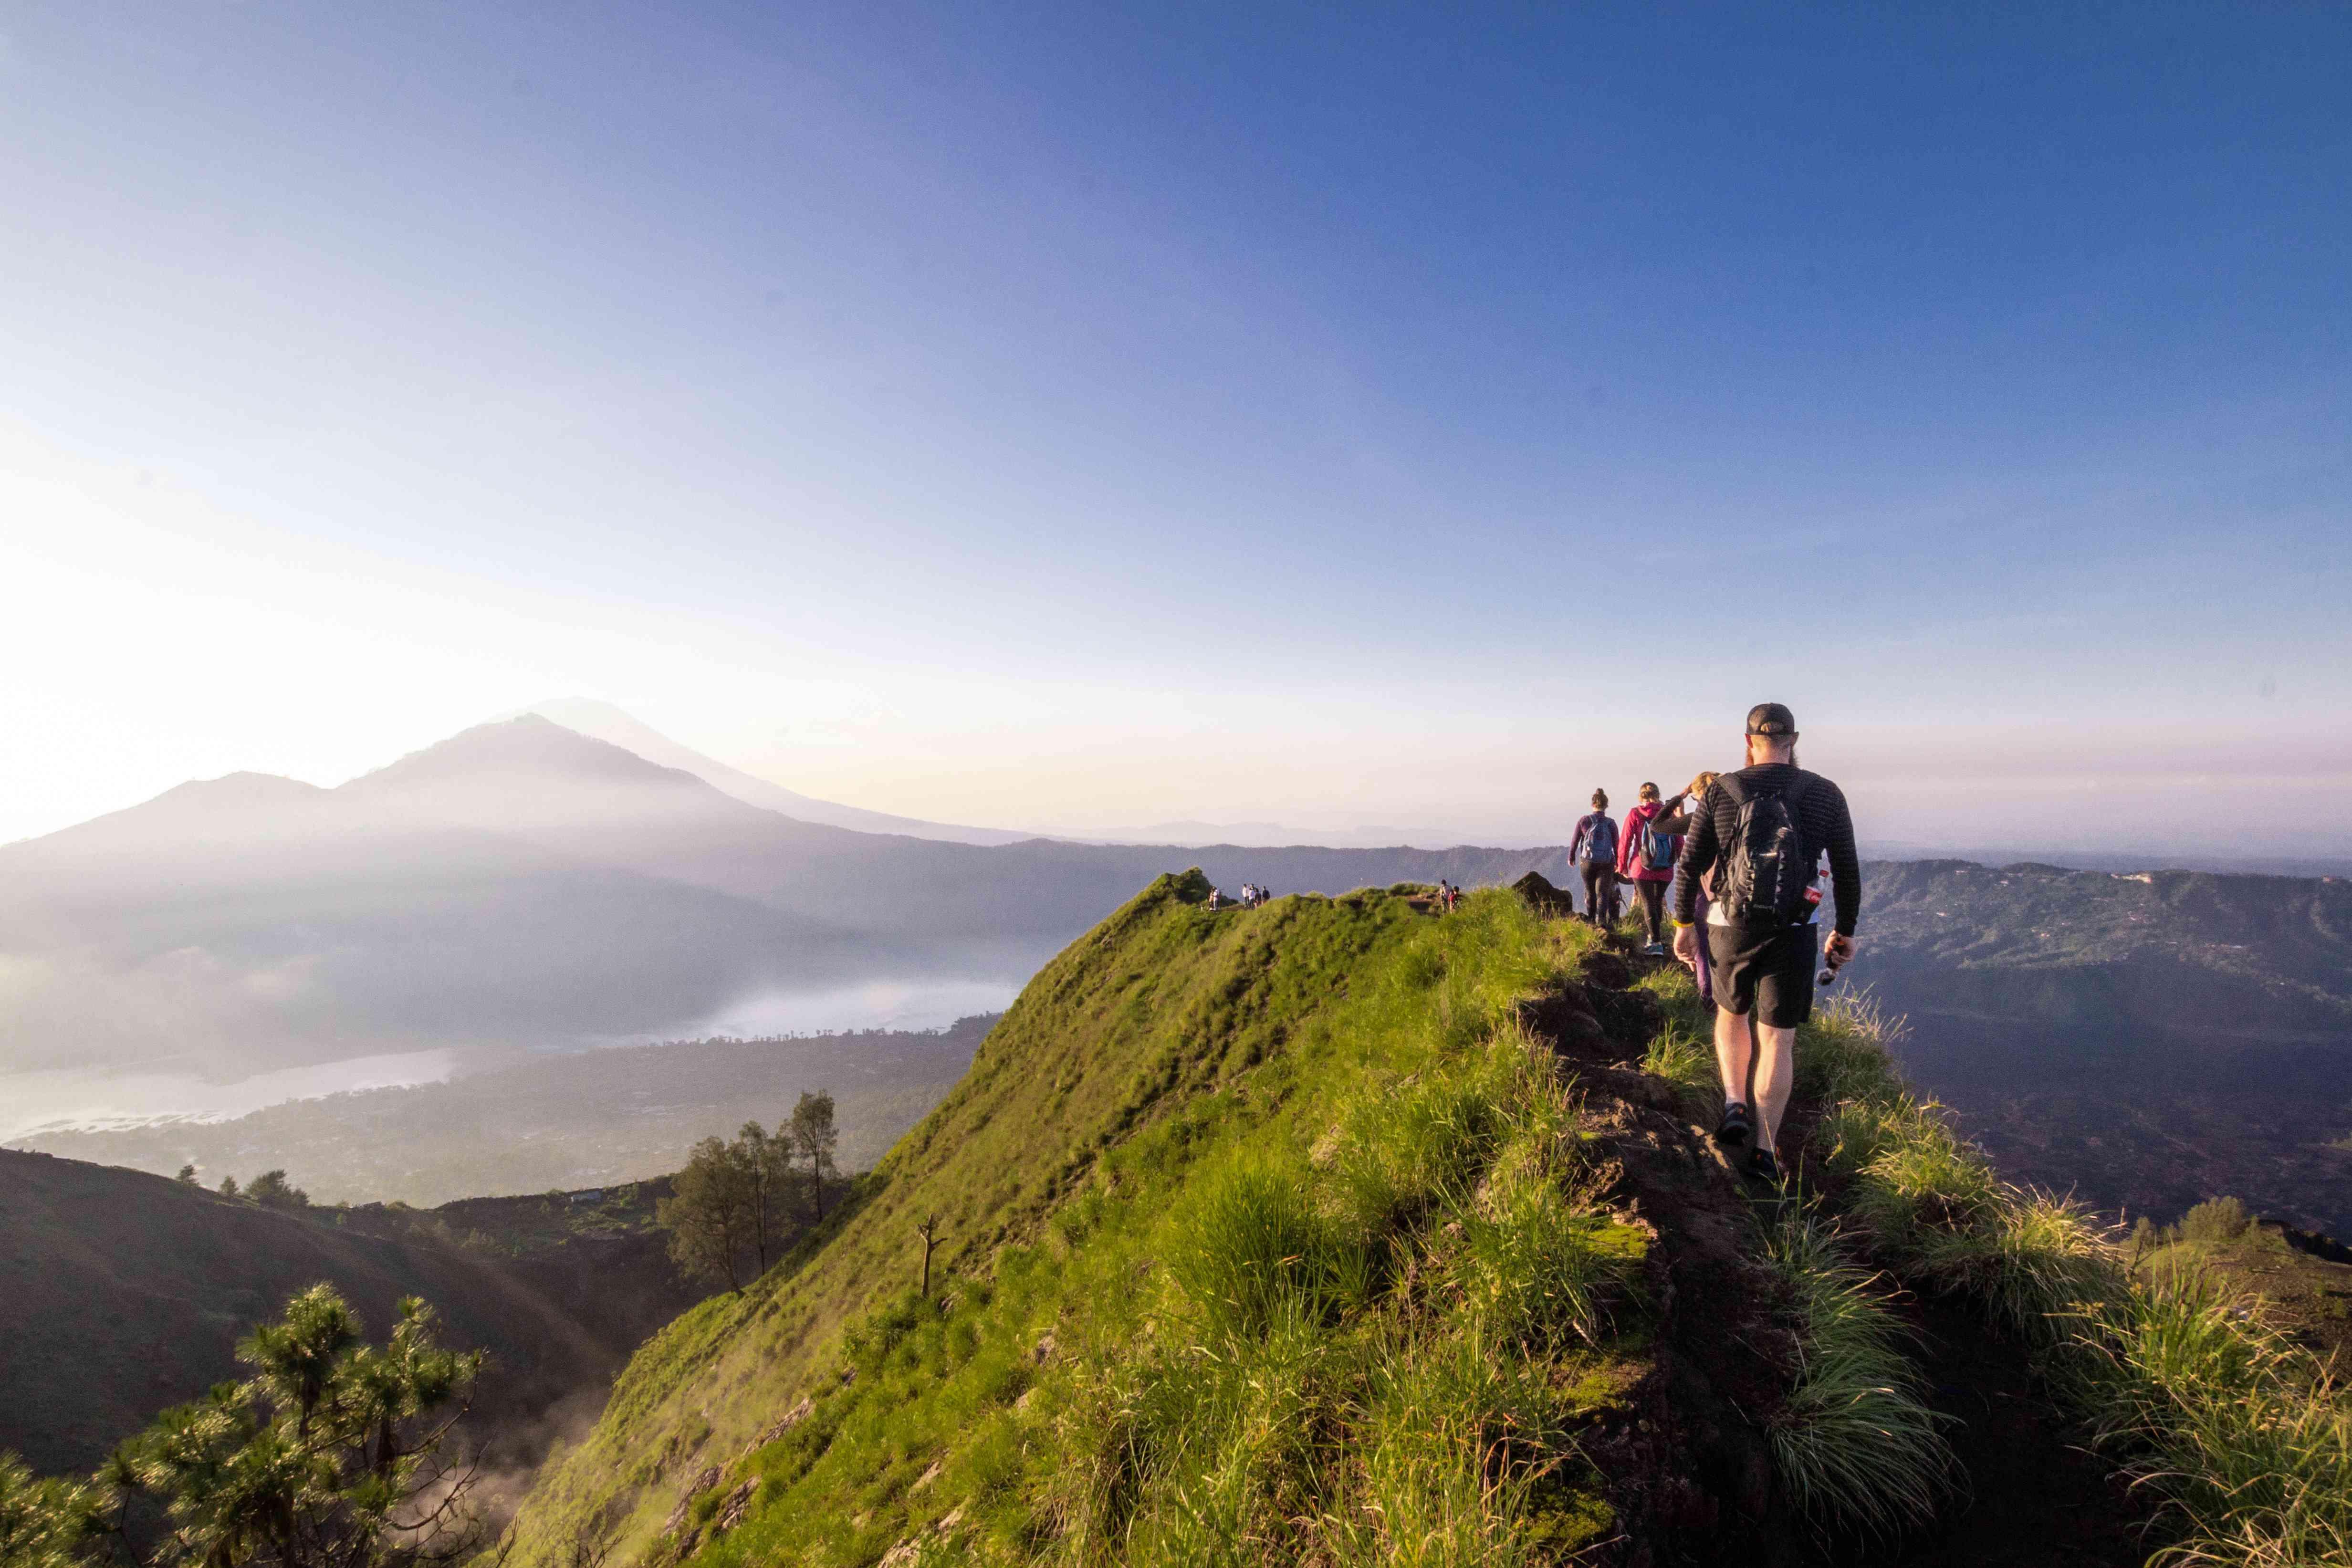 People hiking atop Mount Batur in Bali